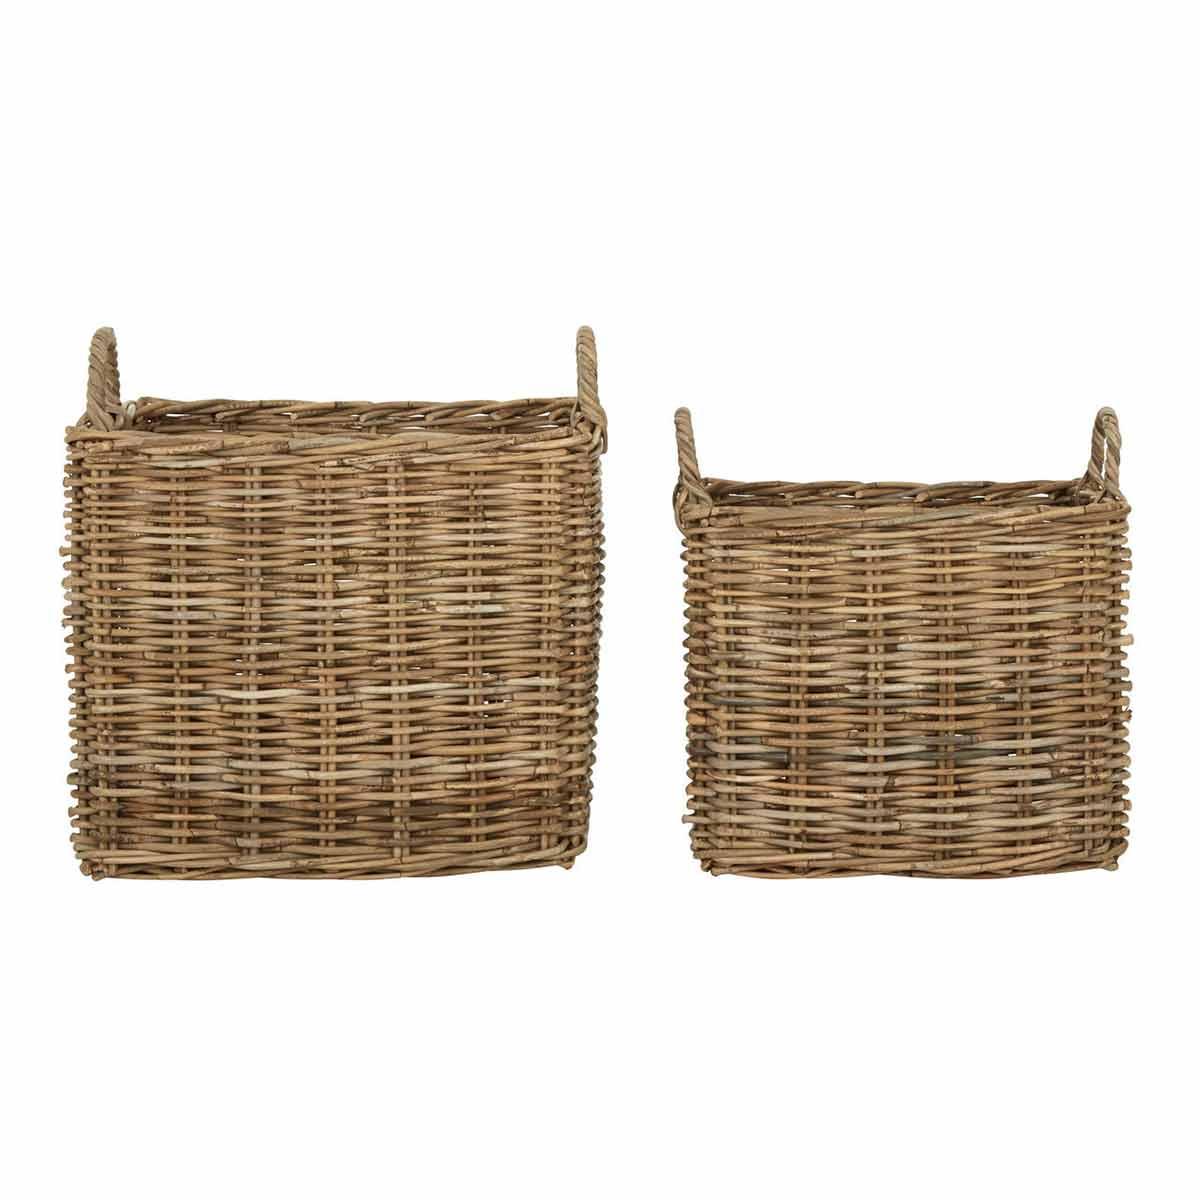 Argento Storage Baskets Grey Set of 2, Grey